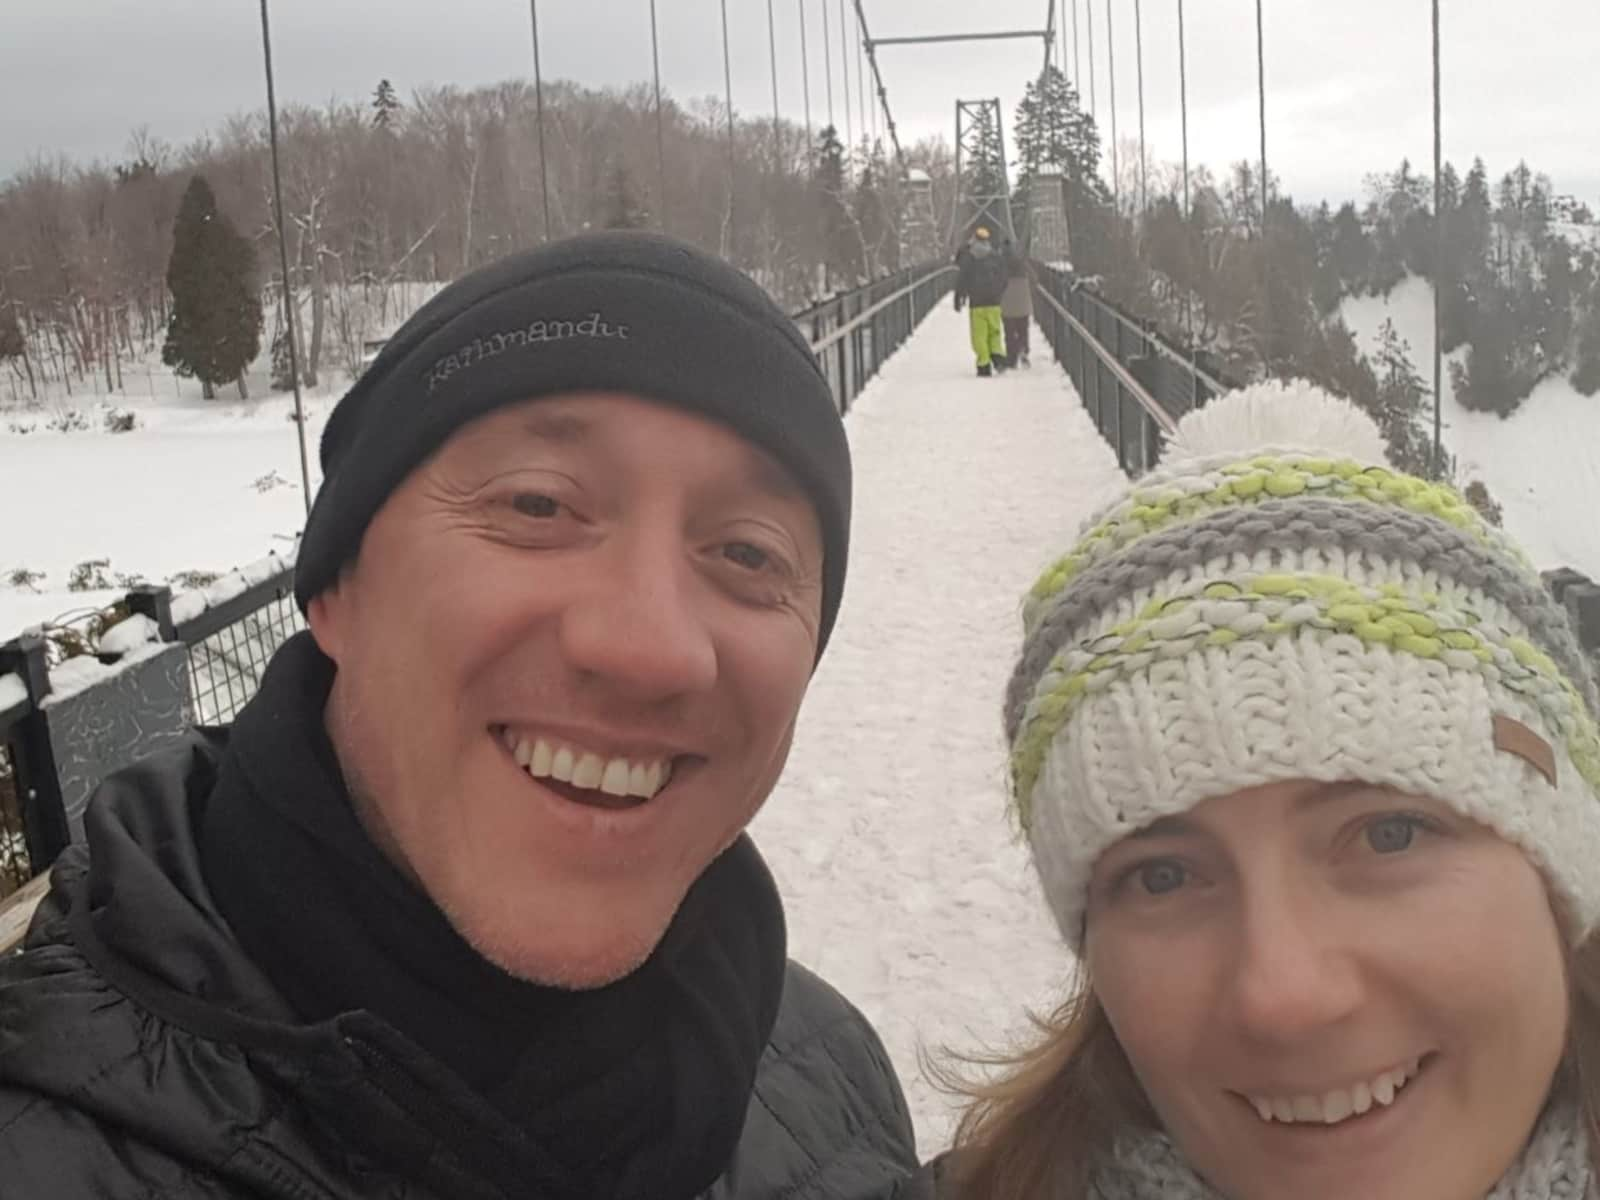 Pieta & Tony from Christchurch, New Zealand